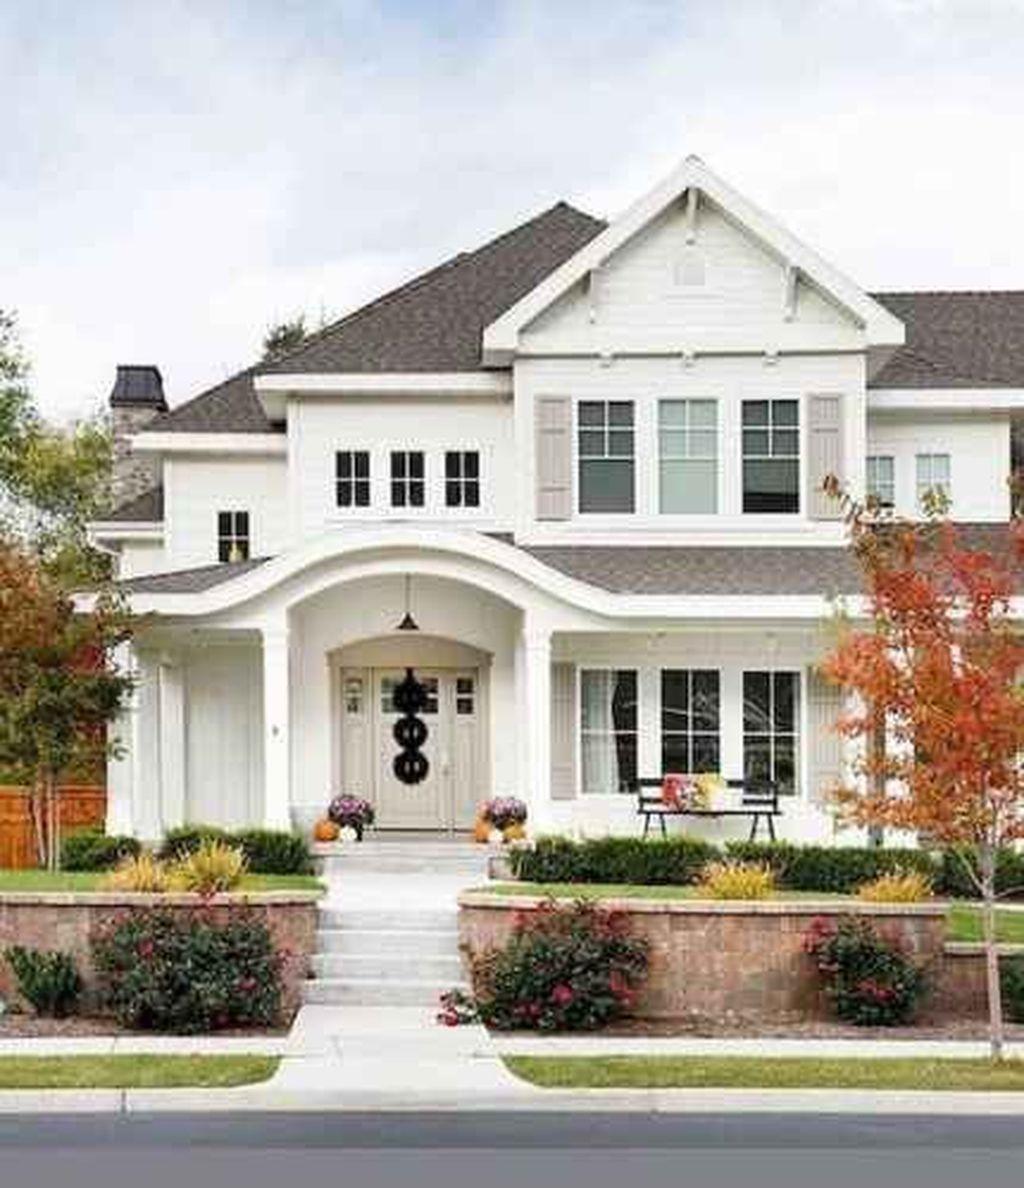 30 cozy farmhouse exterior design ideas that looks cool